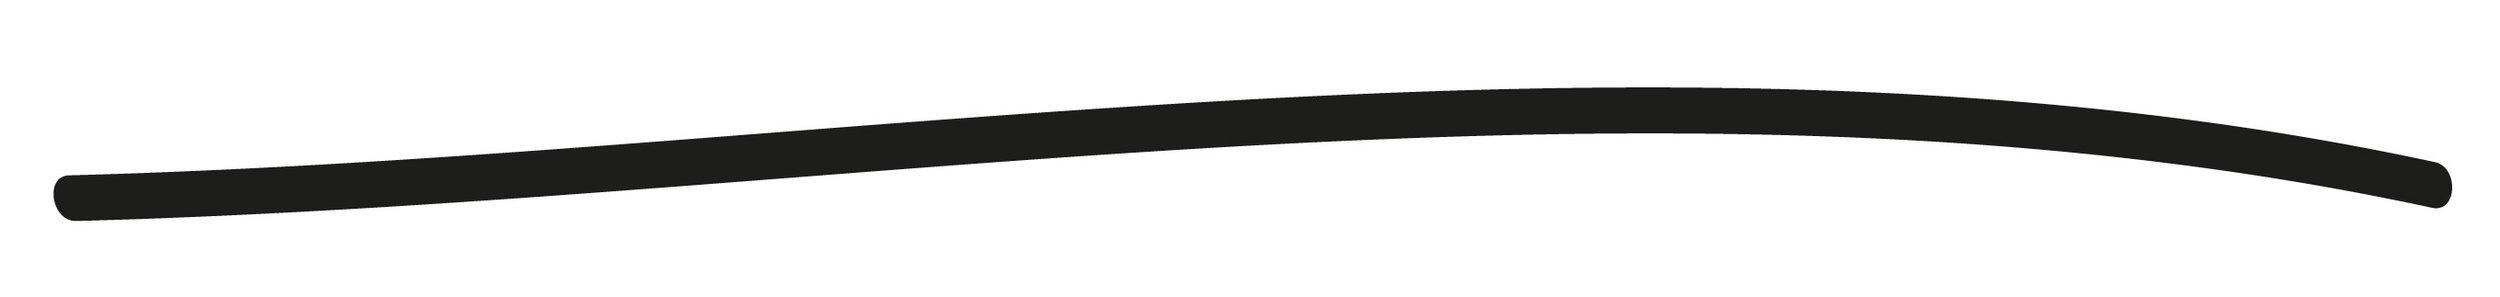 line-01.jpg